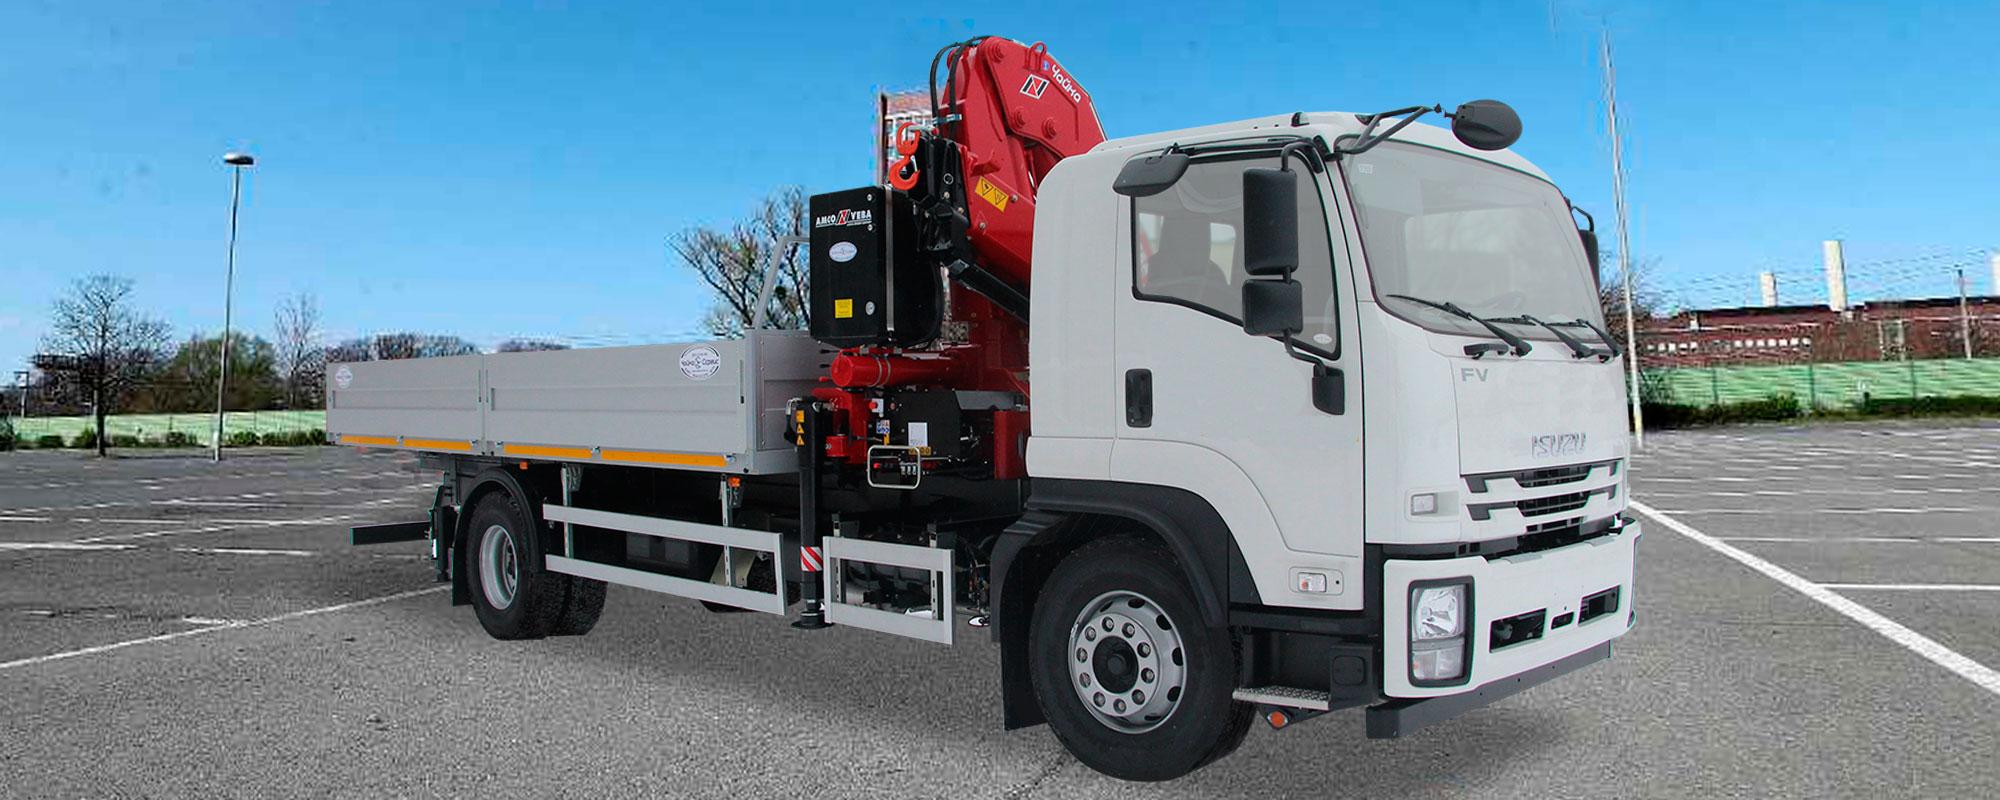 Перевозка грузов манипулятор